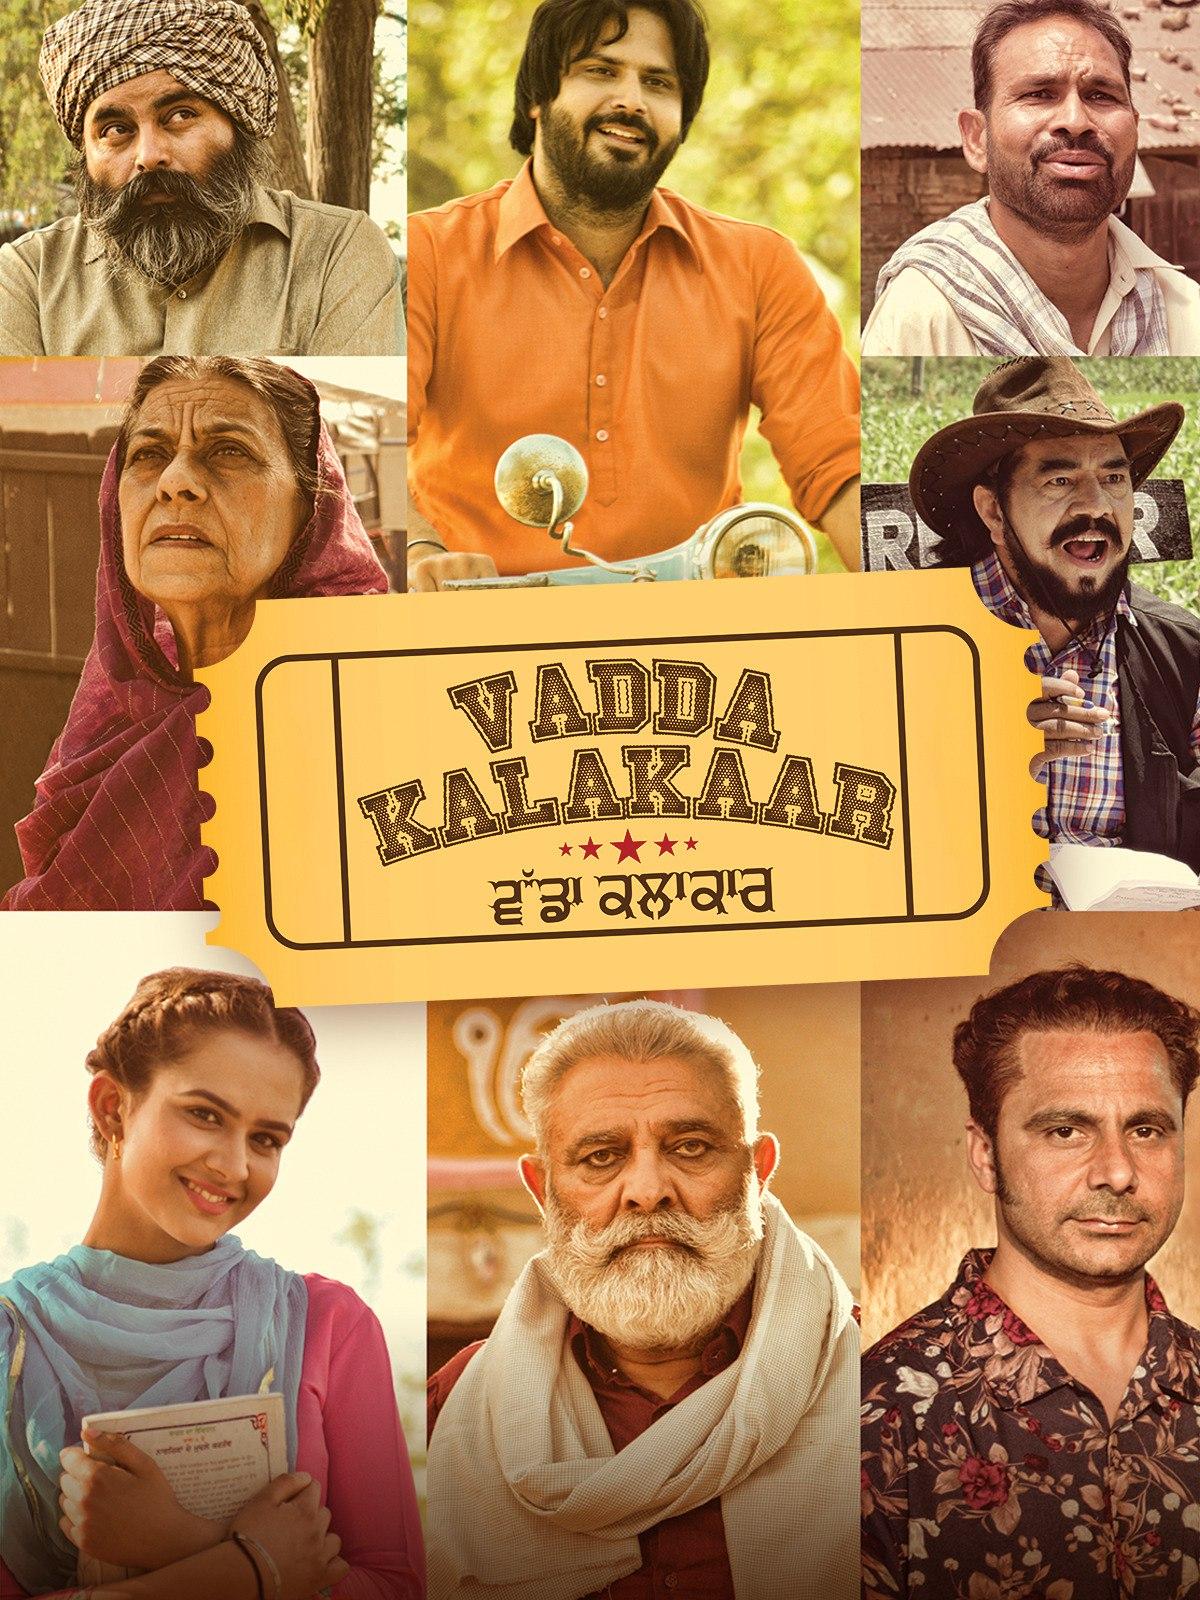 Vadda Kalakaar (2018) Punjabi 720p HEVC HDRip x265 AAC ESubs Full  (750MB) Full Movie Download